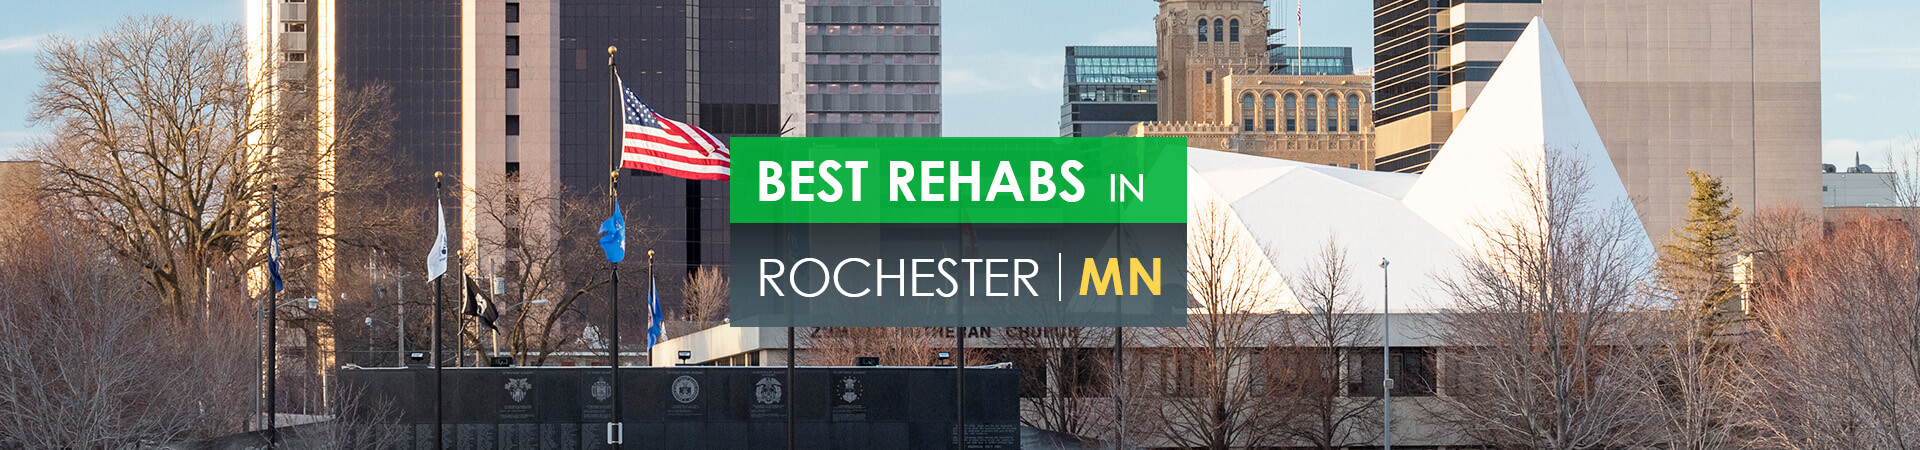 Best rehabs in Rochester, MN